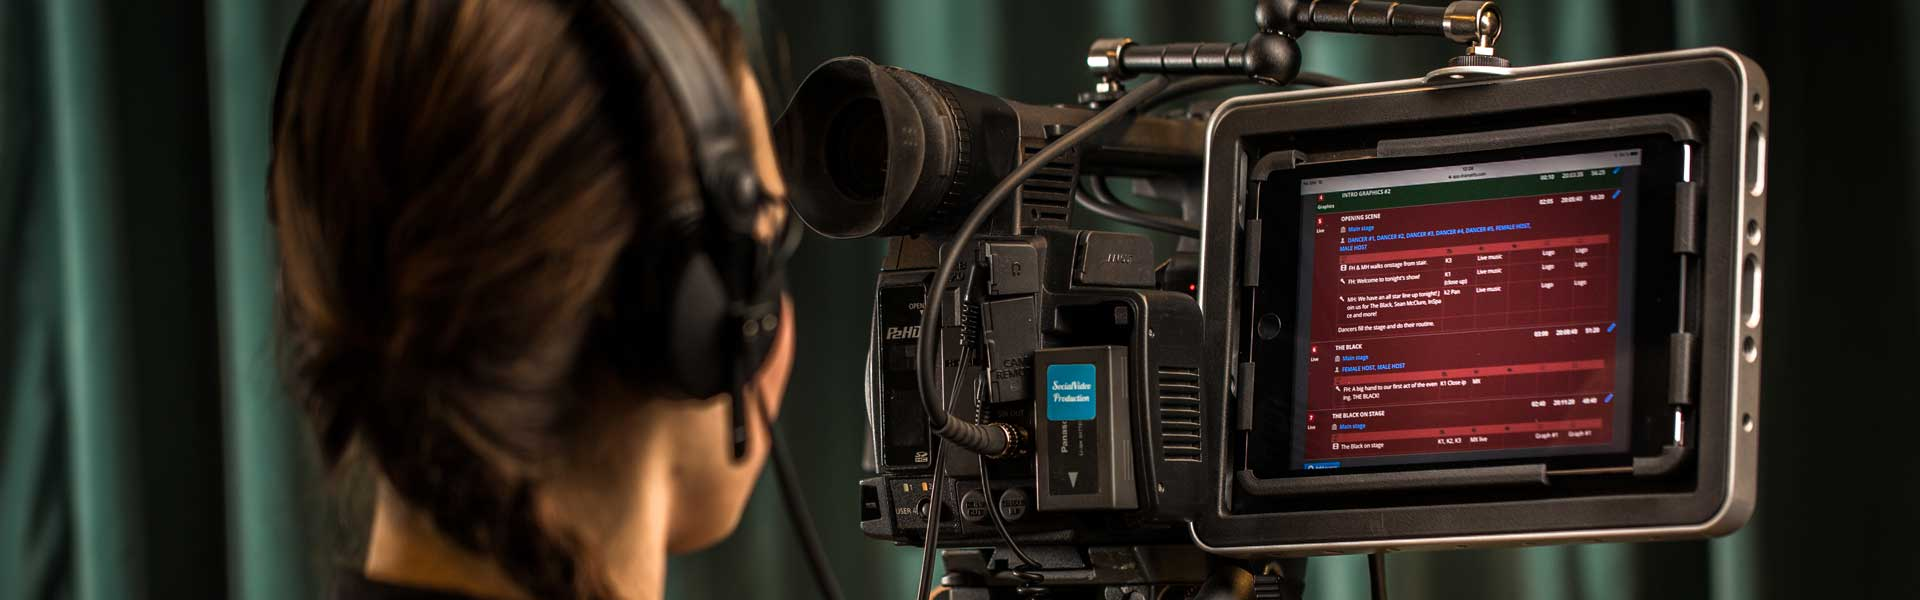 Press release: World's first smart script tool for multi-camera live & studio shows